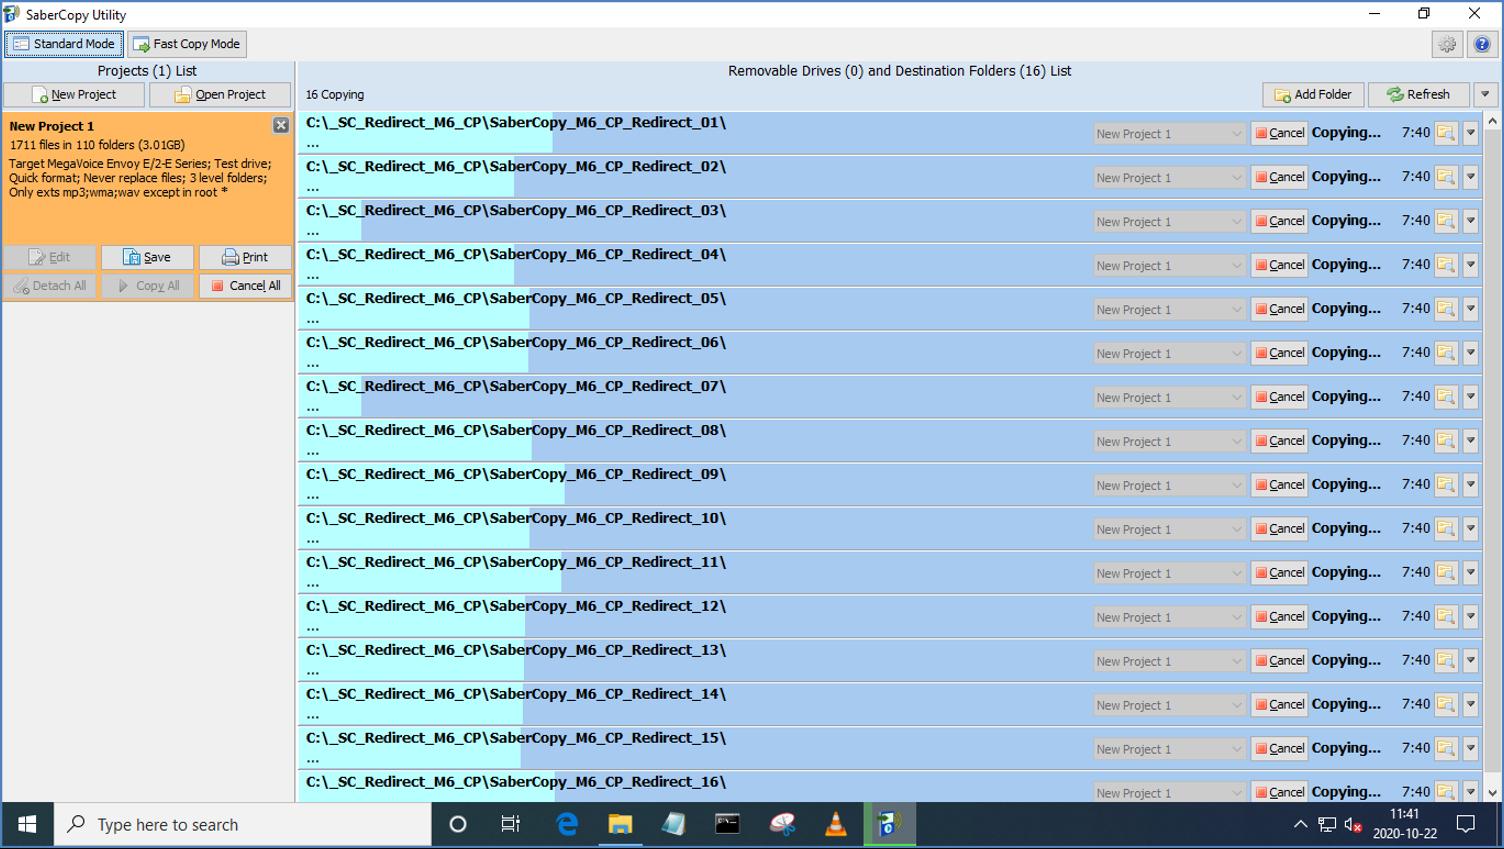 MegaVoice SaberCopy - Screenshot 11